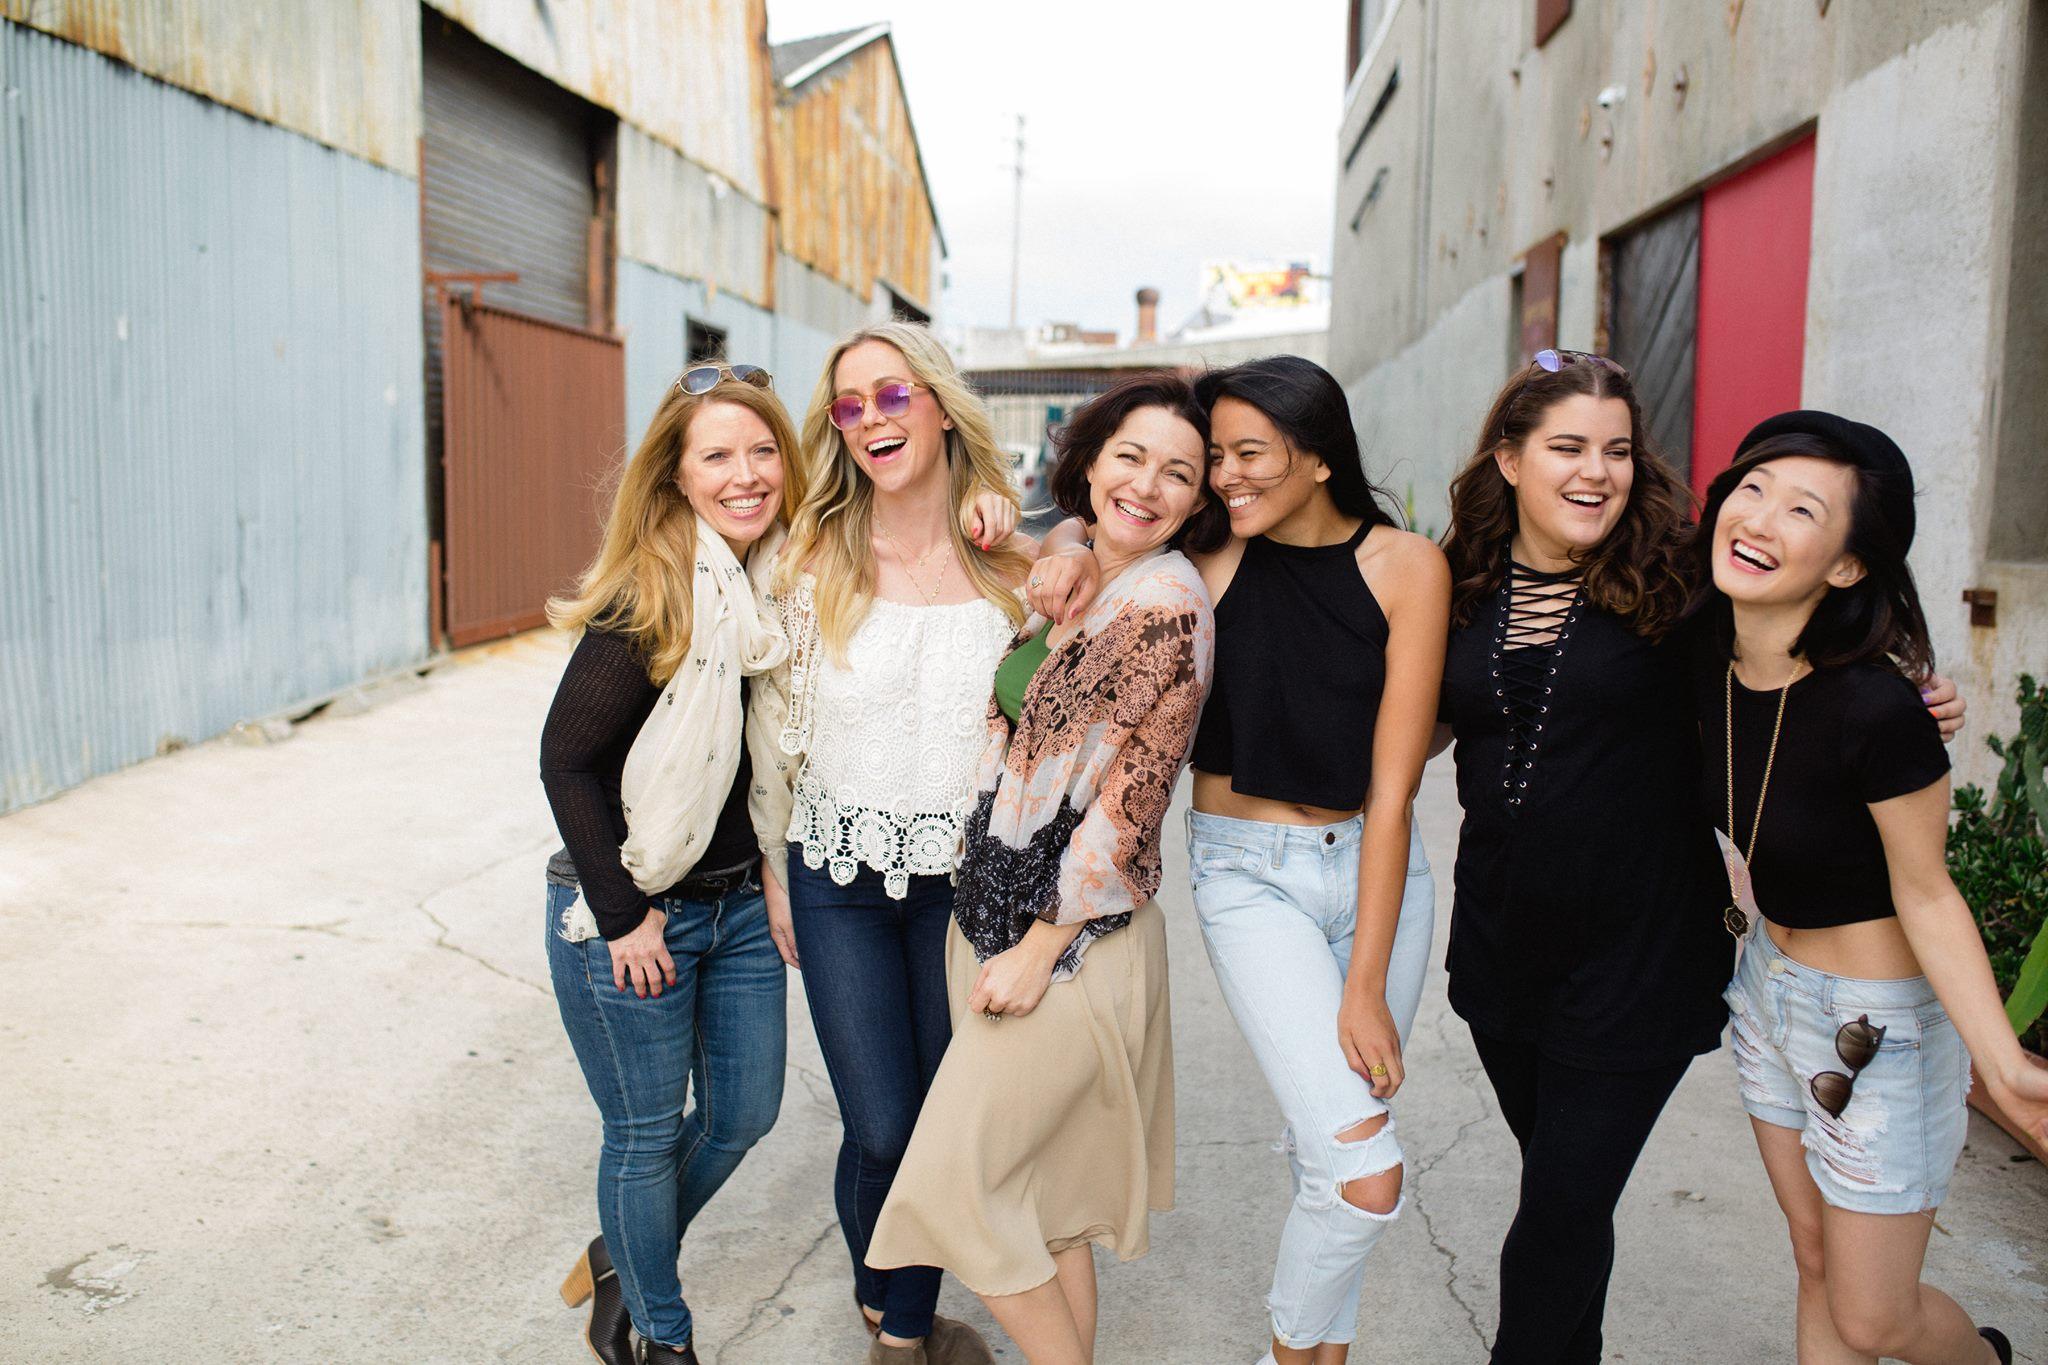 social media vina friendship women